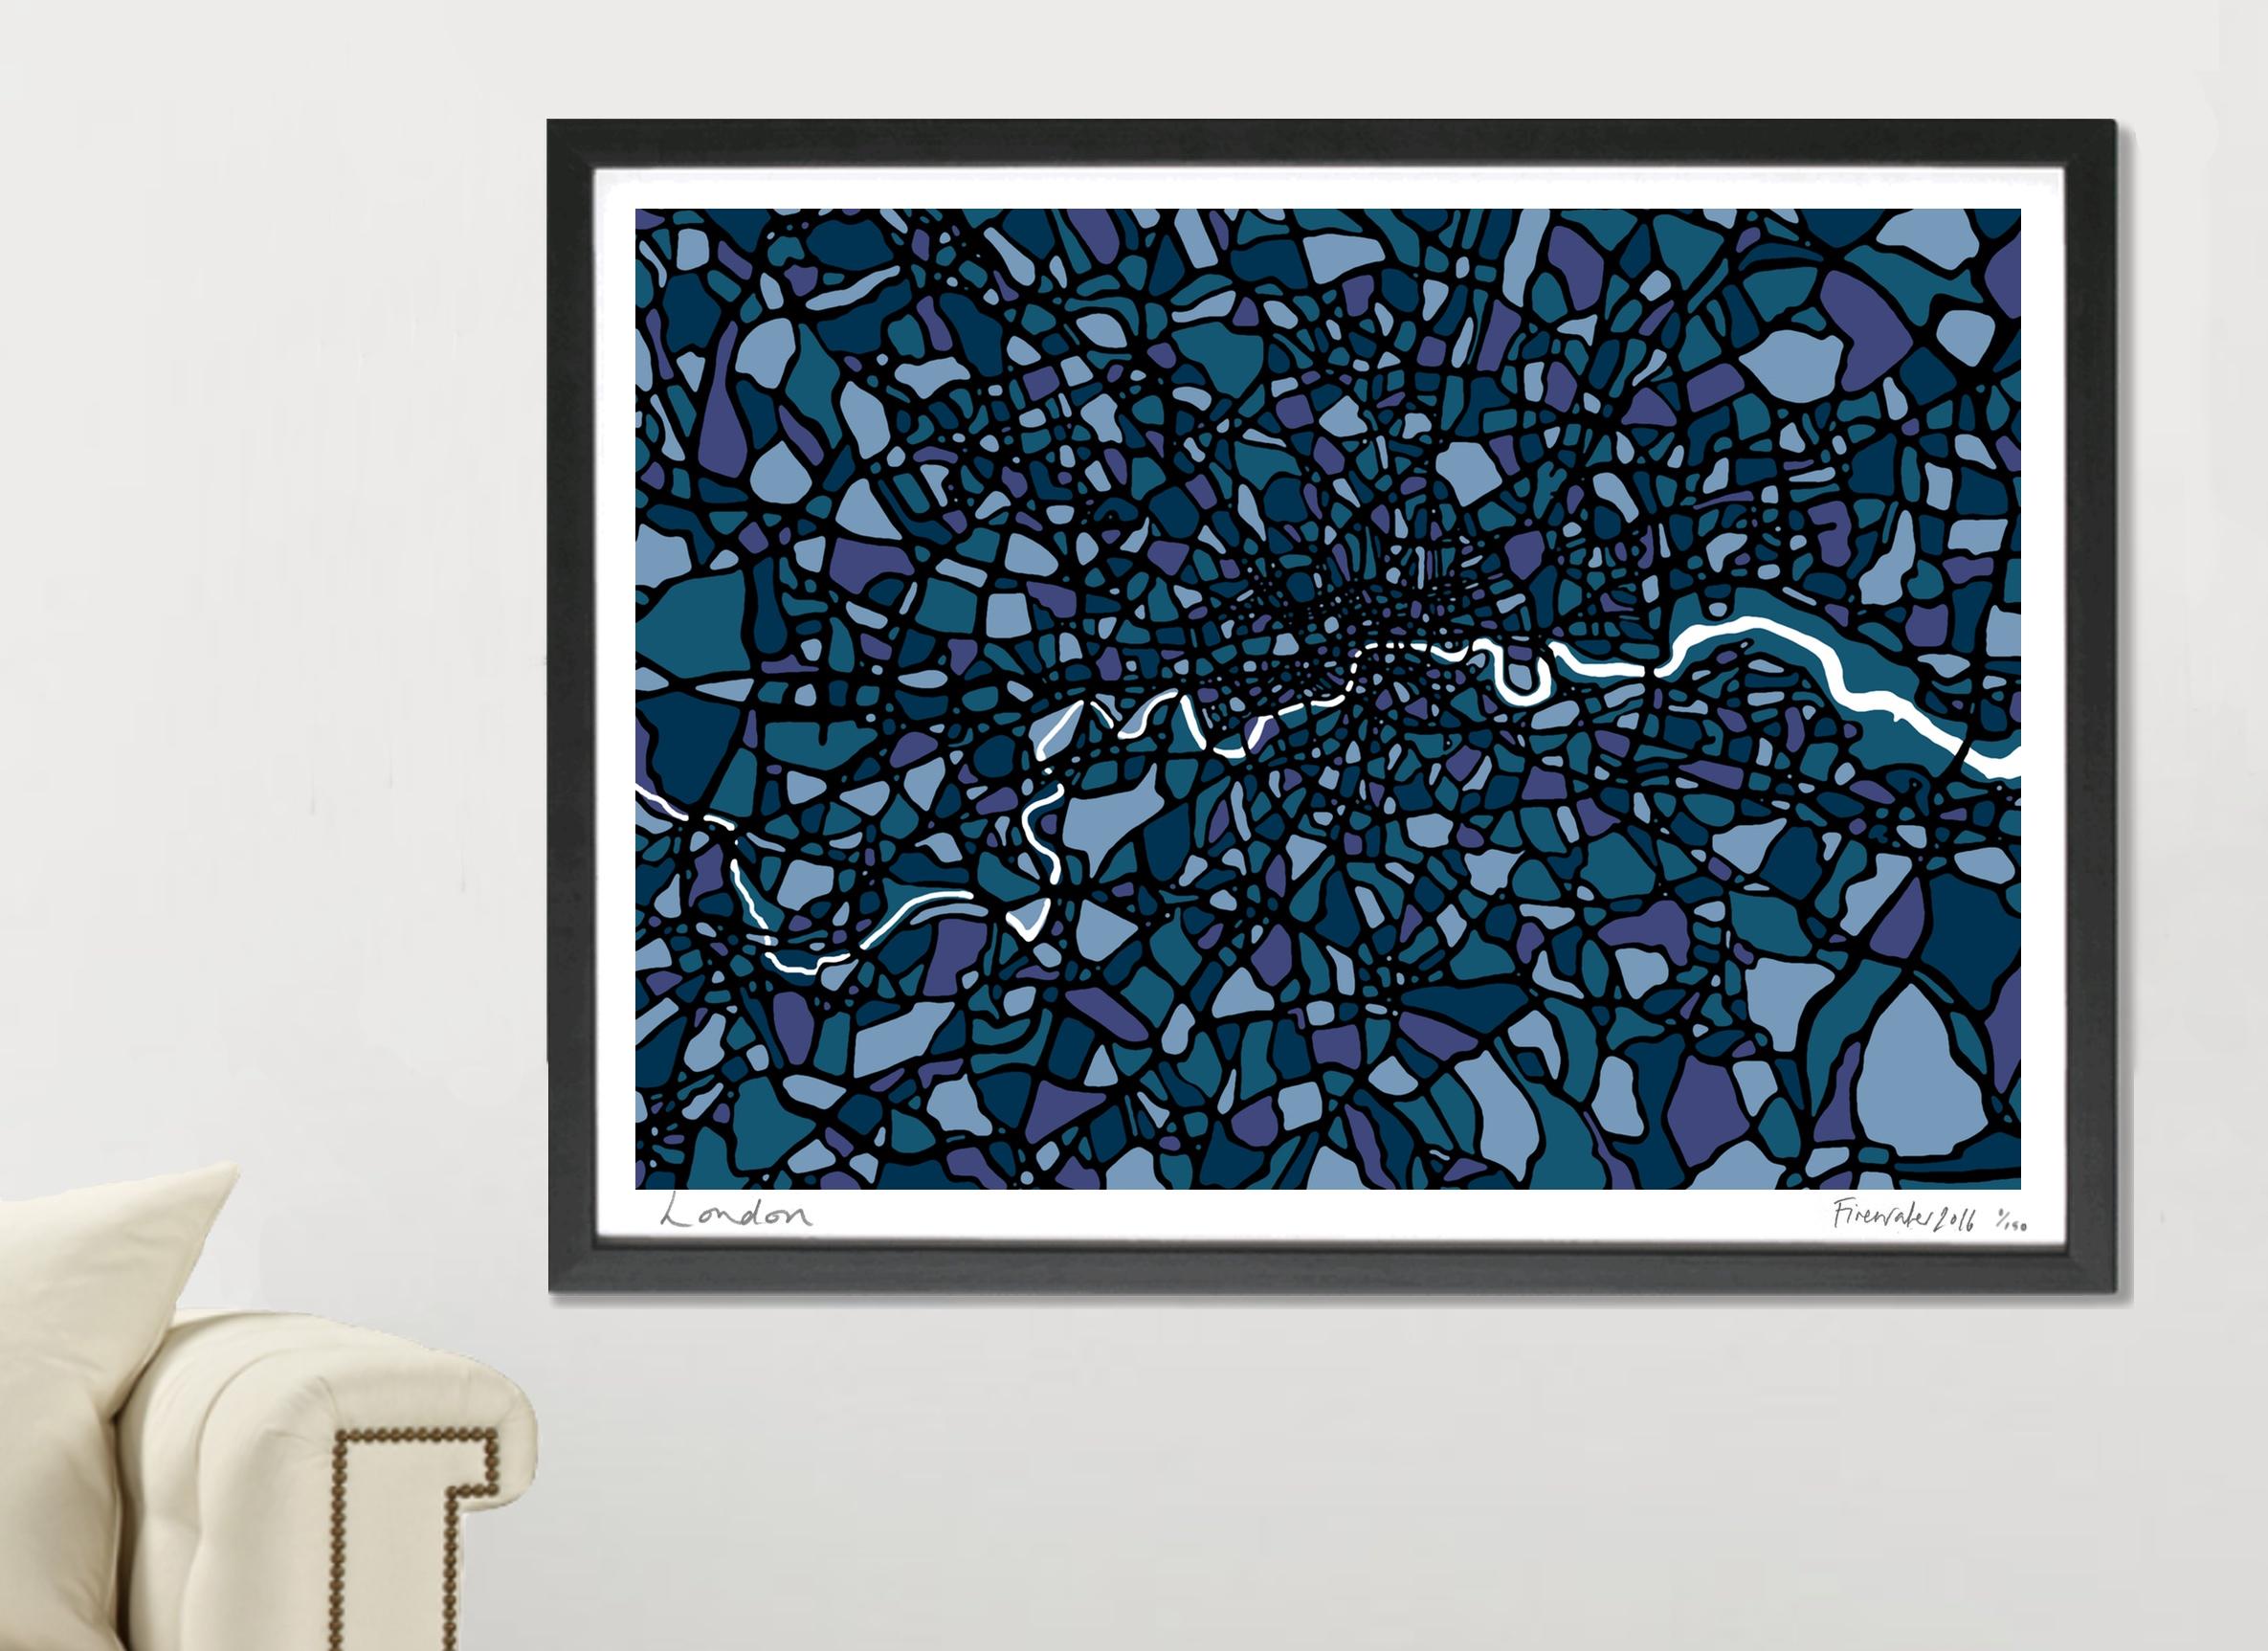 London Art Map - A1 & A2